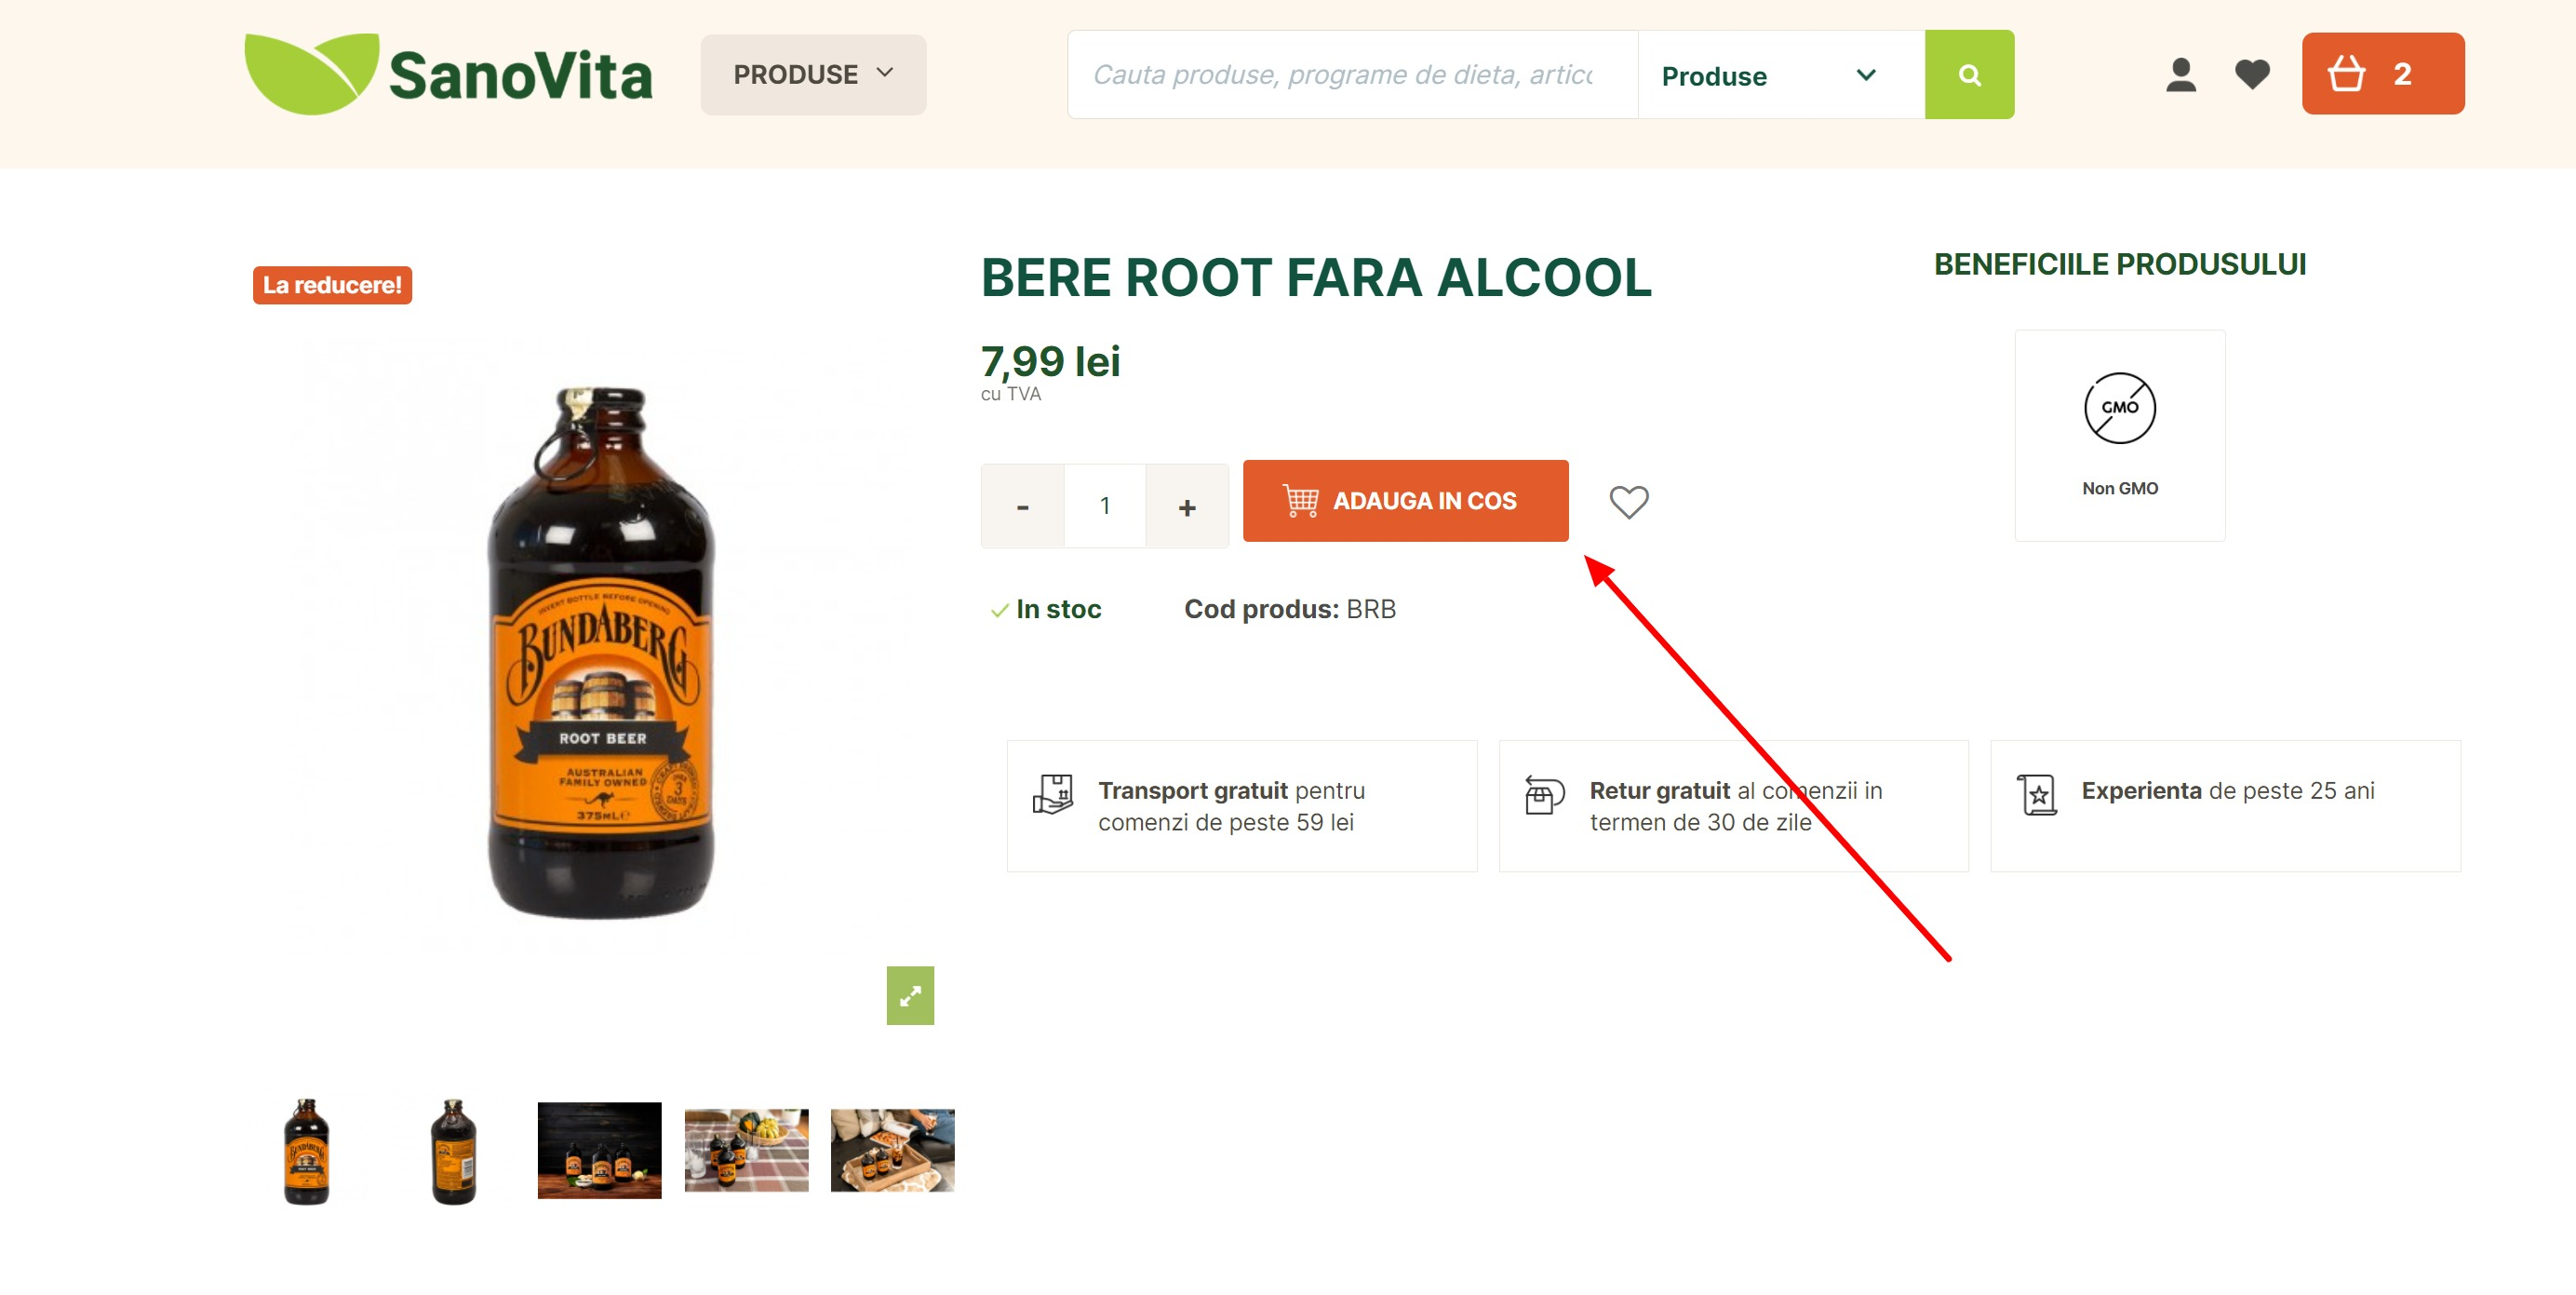 302-bautura-root-beer-375-ml-html.jpg